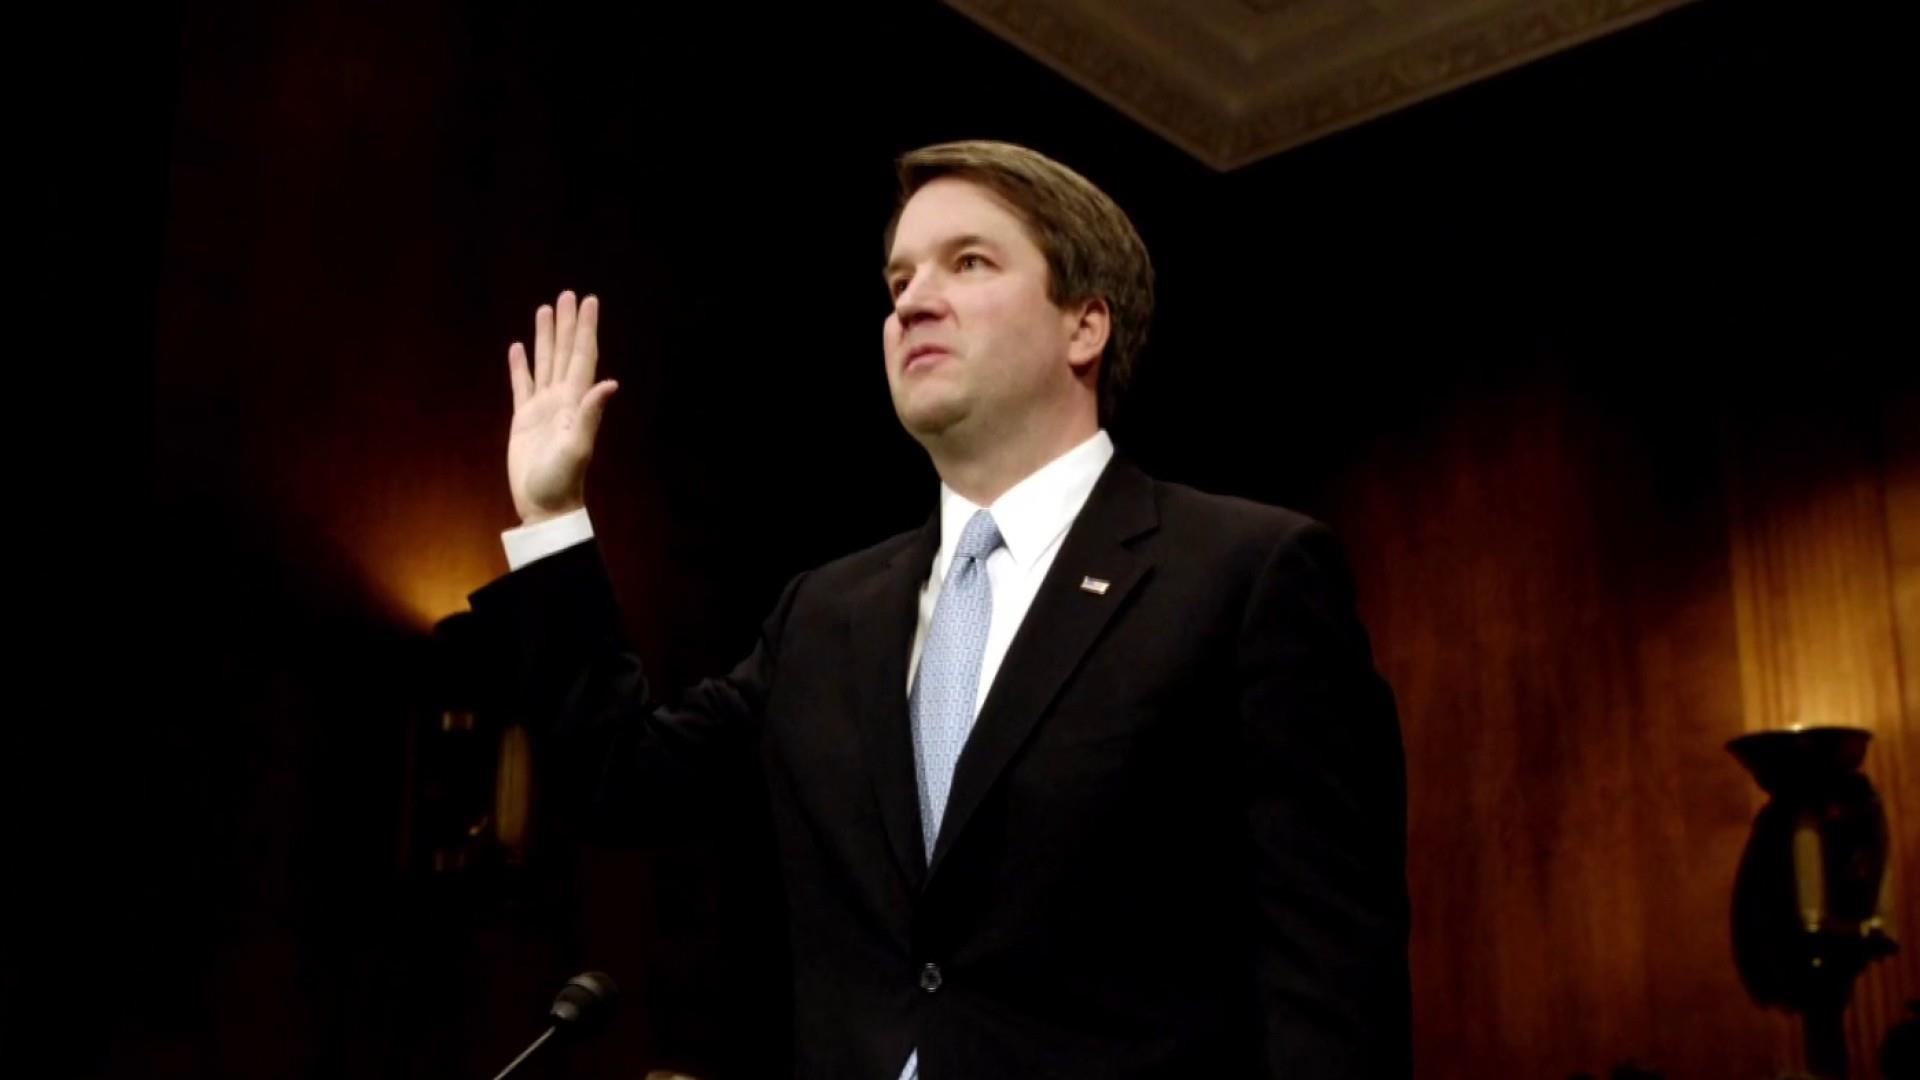 Trump narrows Supreme Court pick to 3 appeals court judges